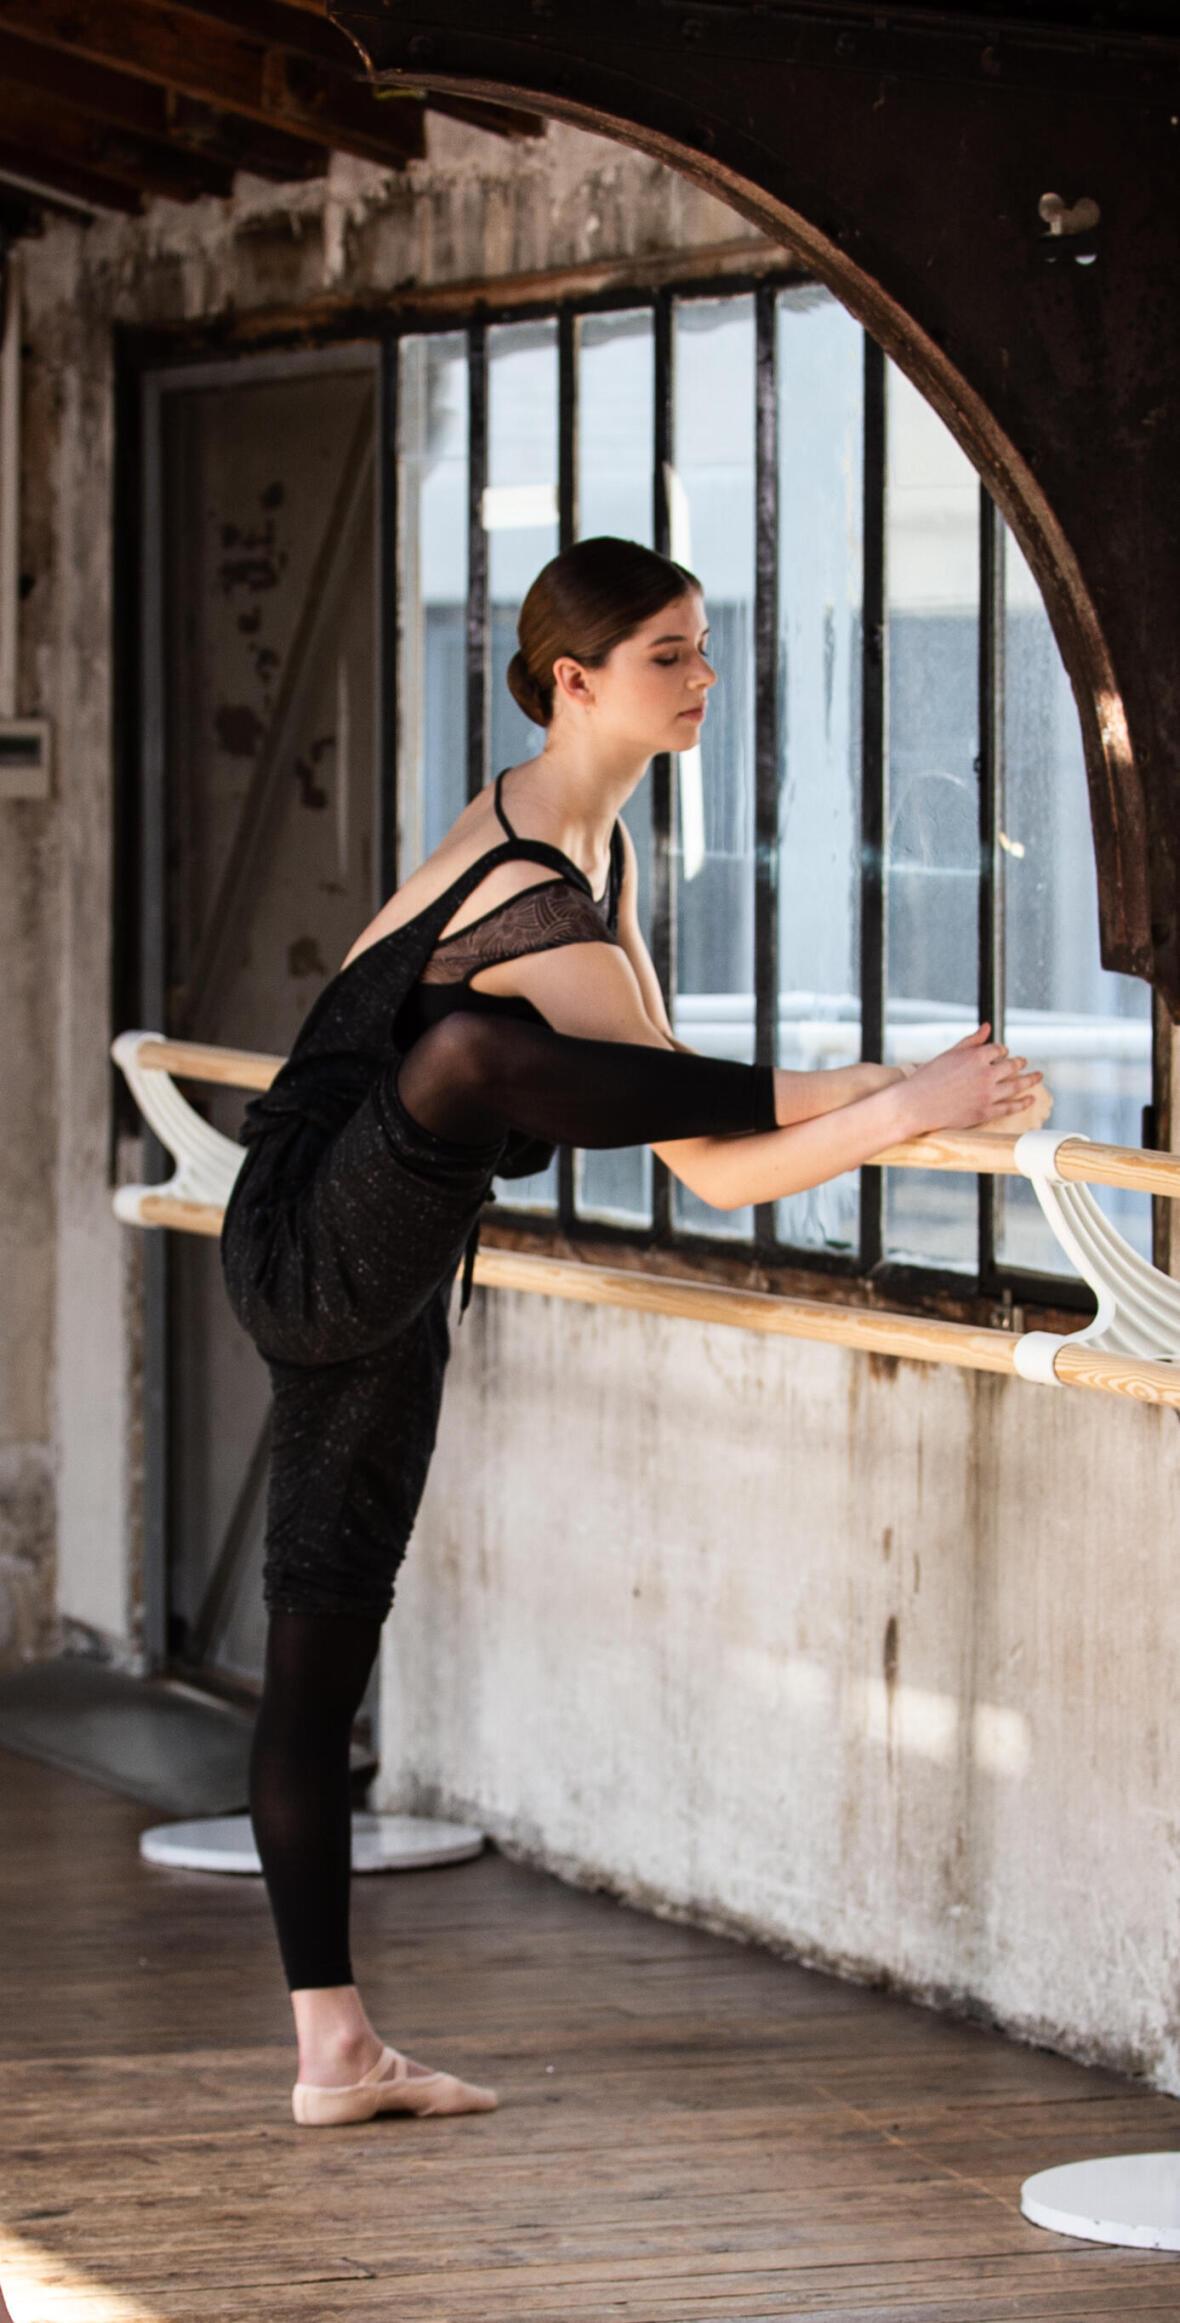 Danse-classique-ania-Bartkowski-decathlon